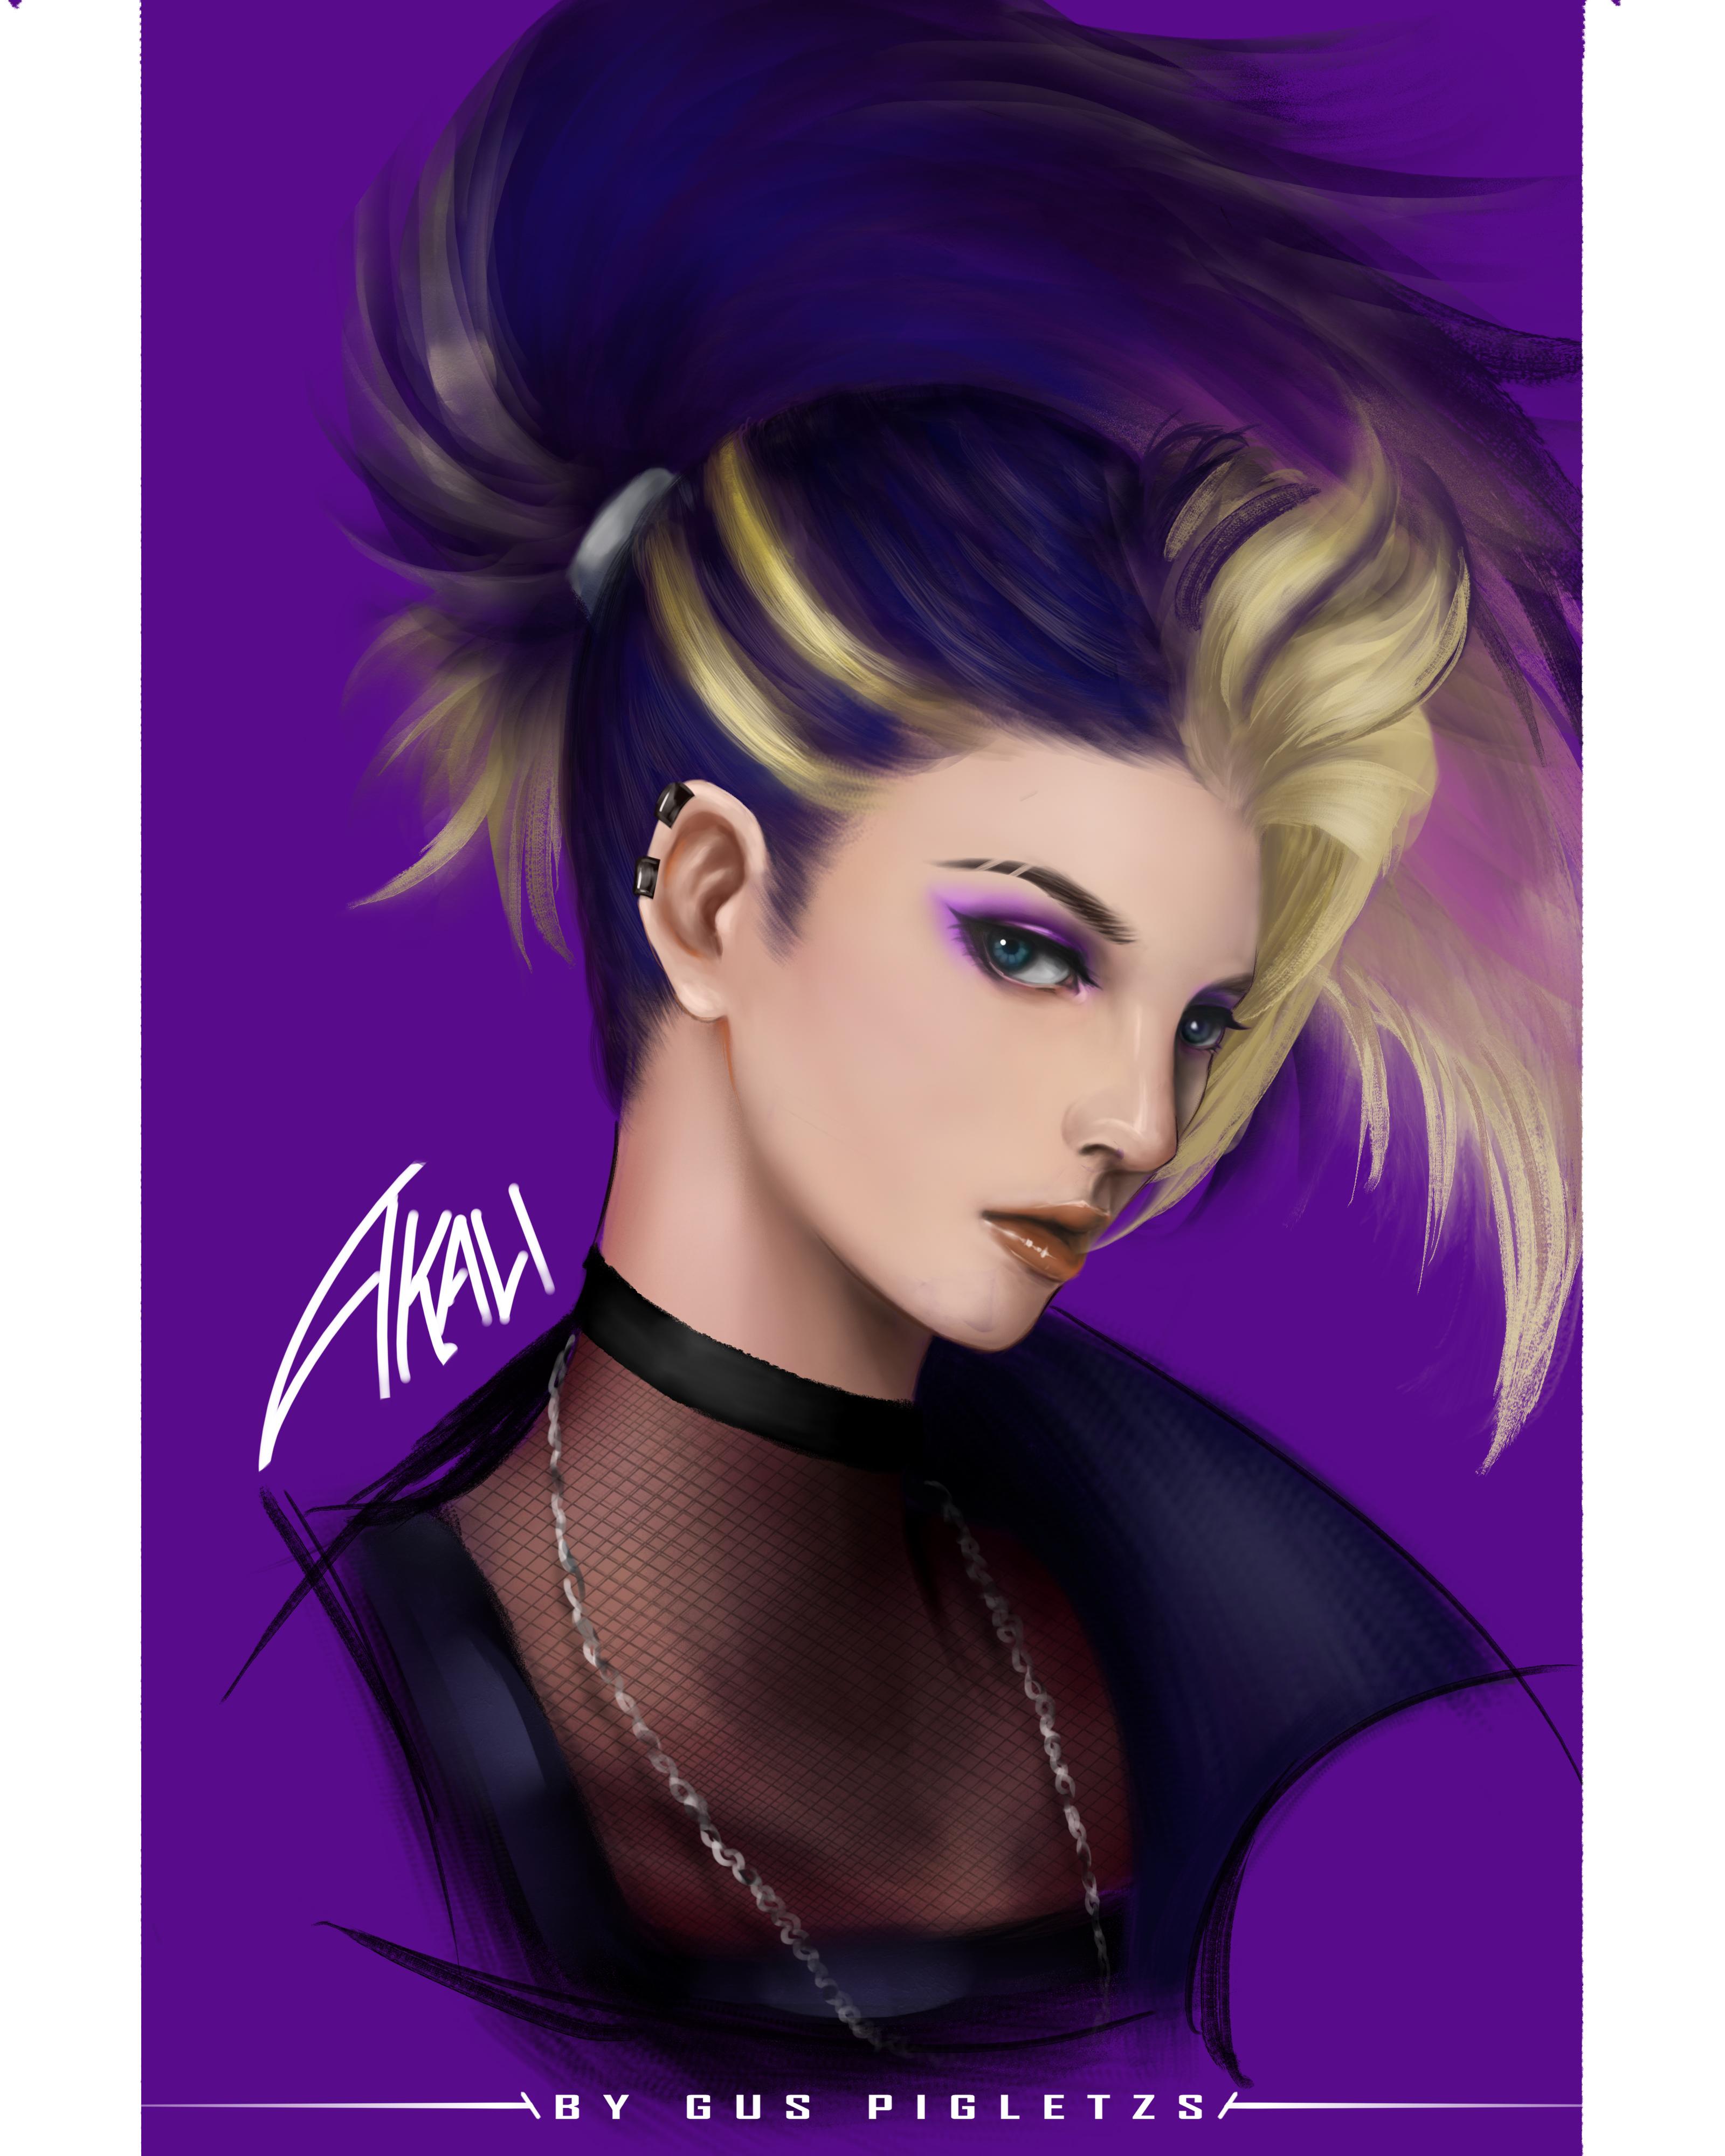 Anime Games League Of Legends Akali Akali League Of Legends Character Design Portrait Illustration G 3200x4000